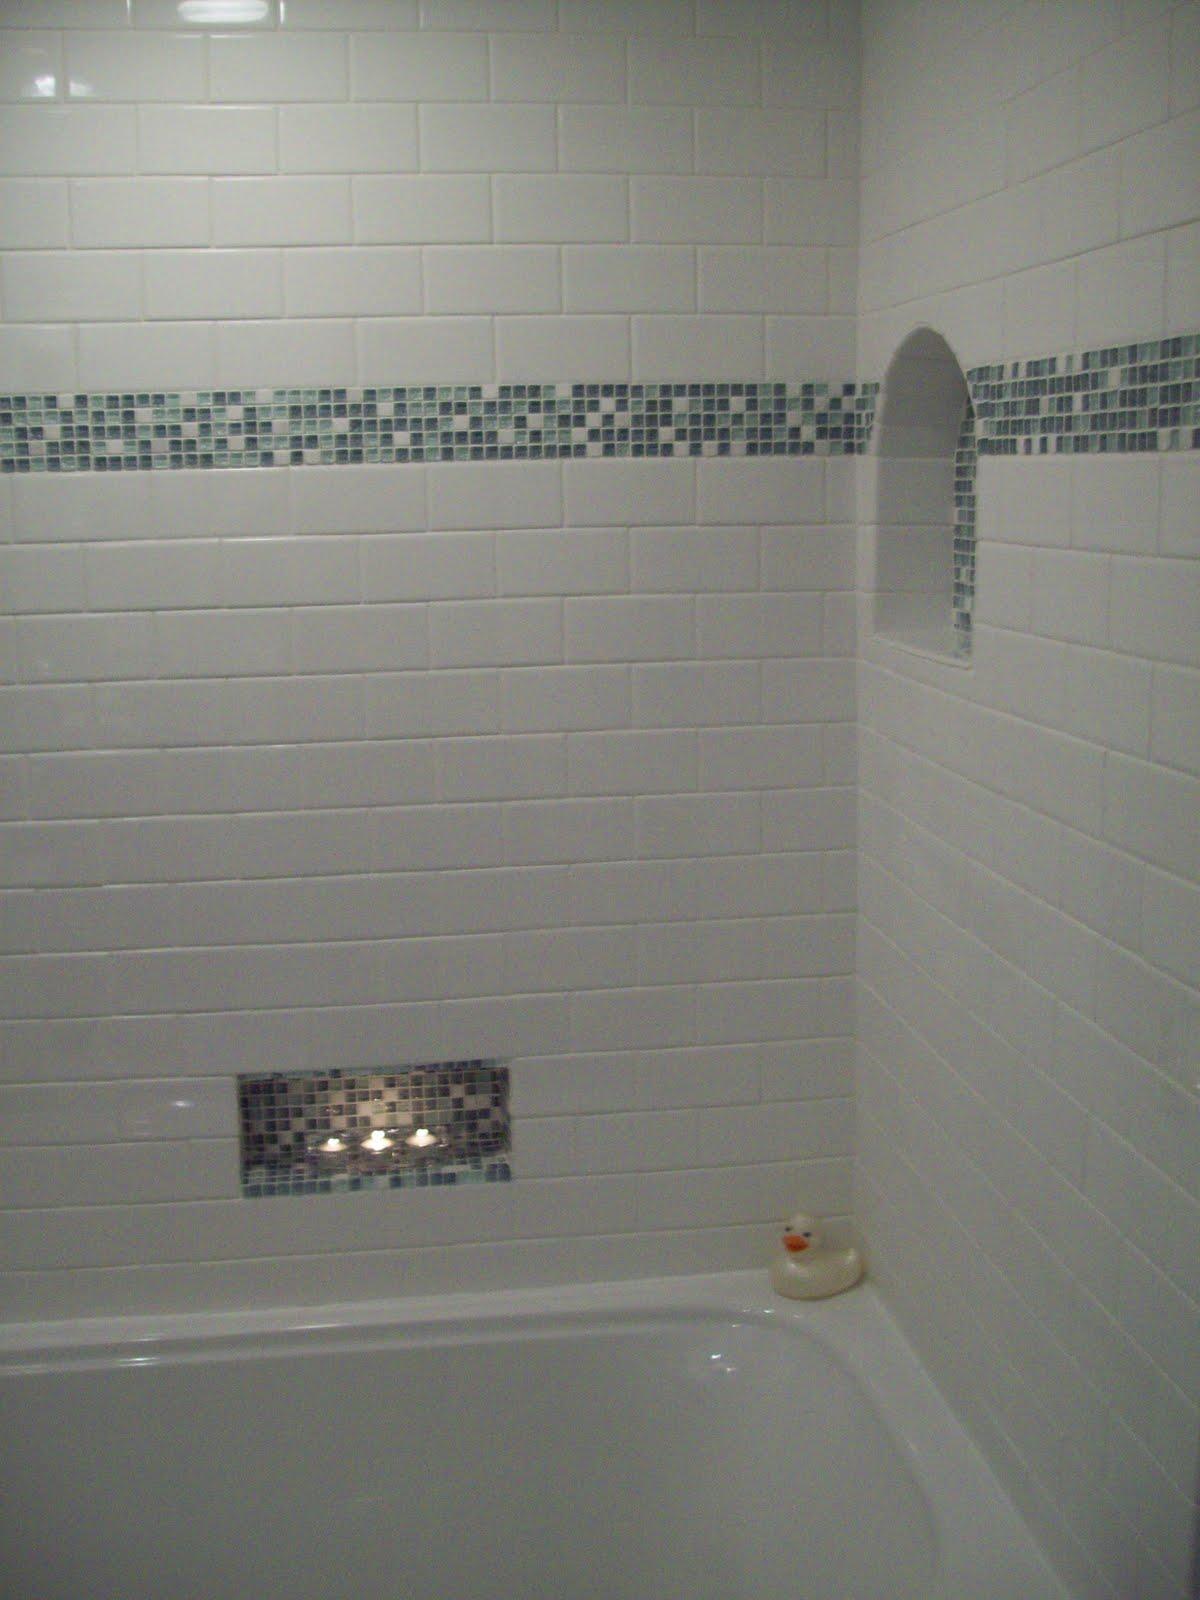 Bathroom Makeovers On A Dime general splendour : happy birthday bathroom! one year ago